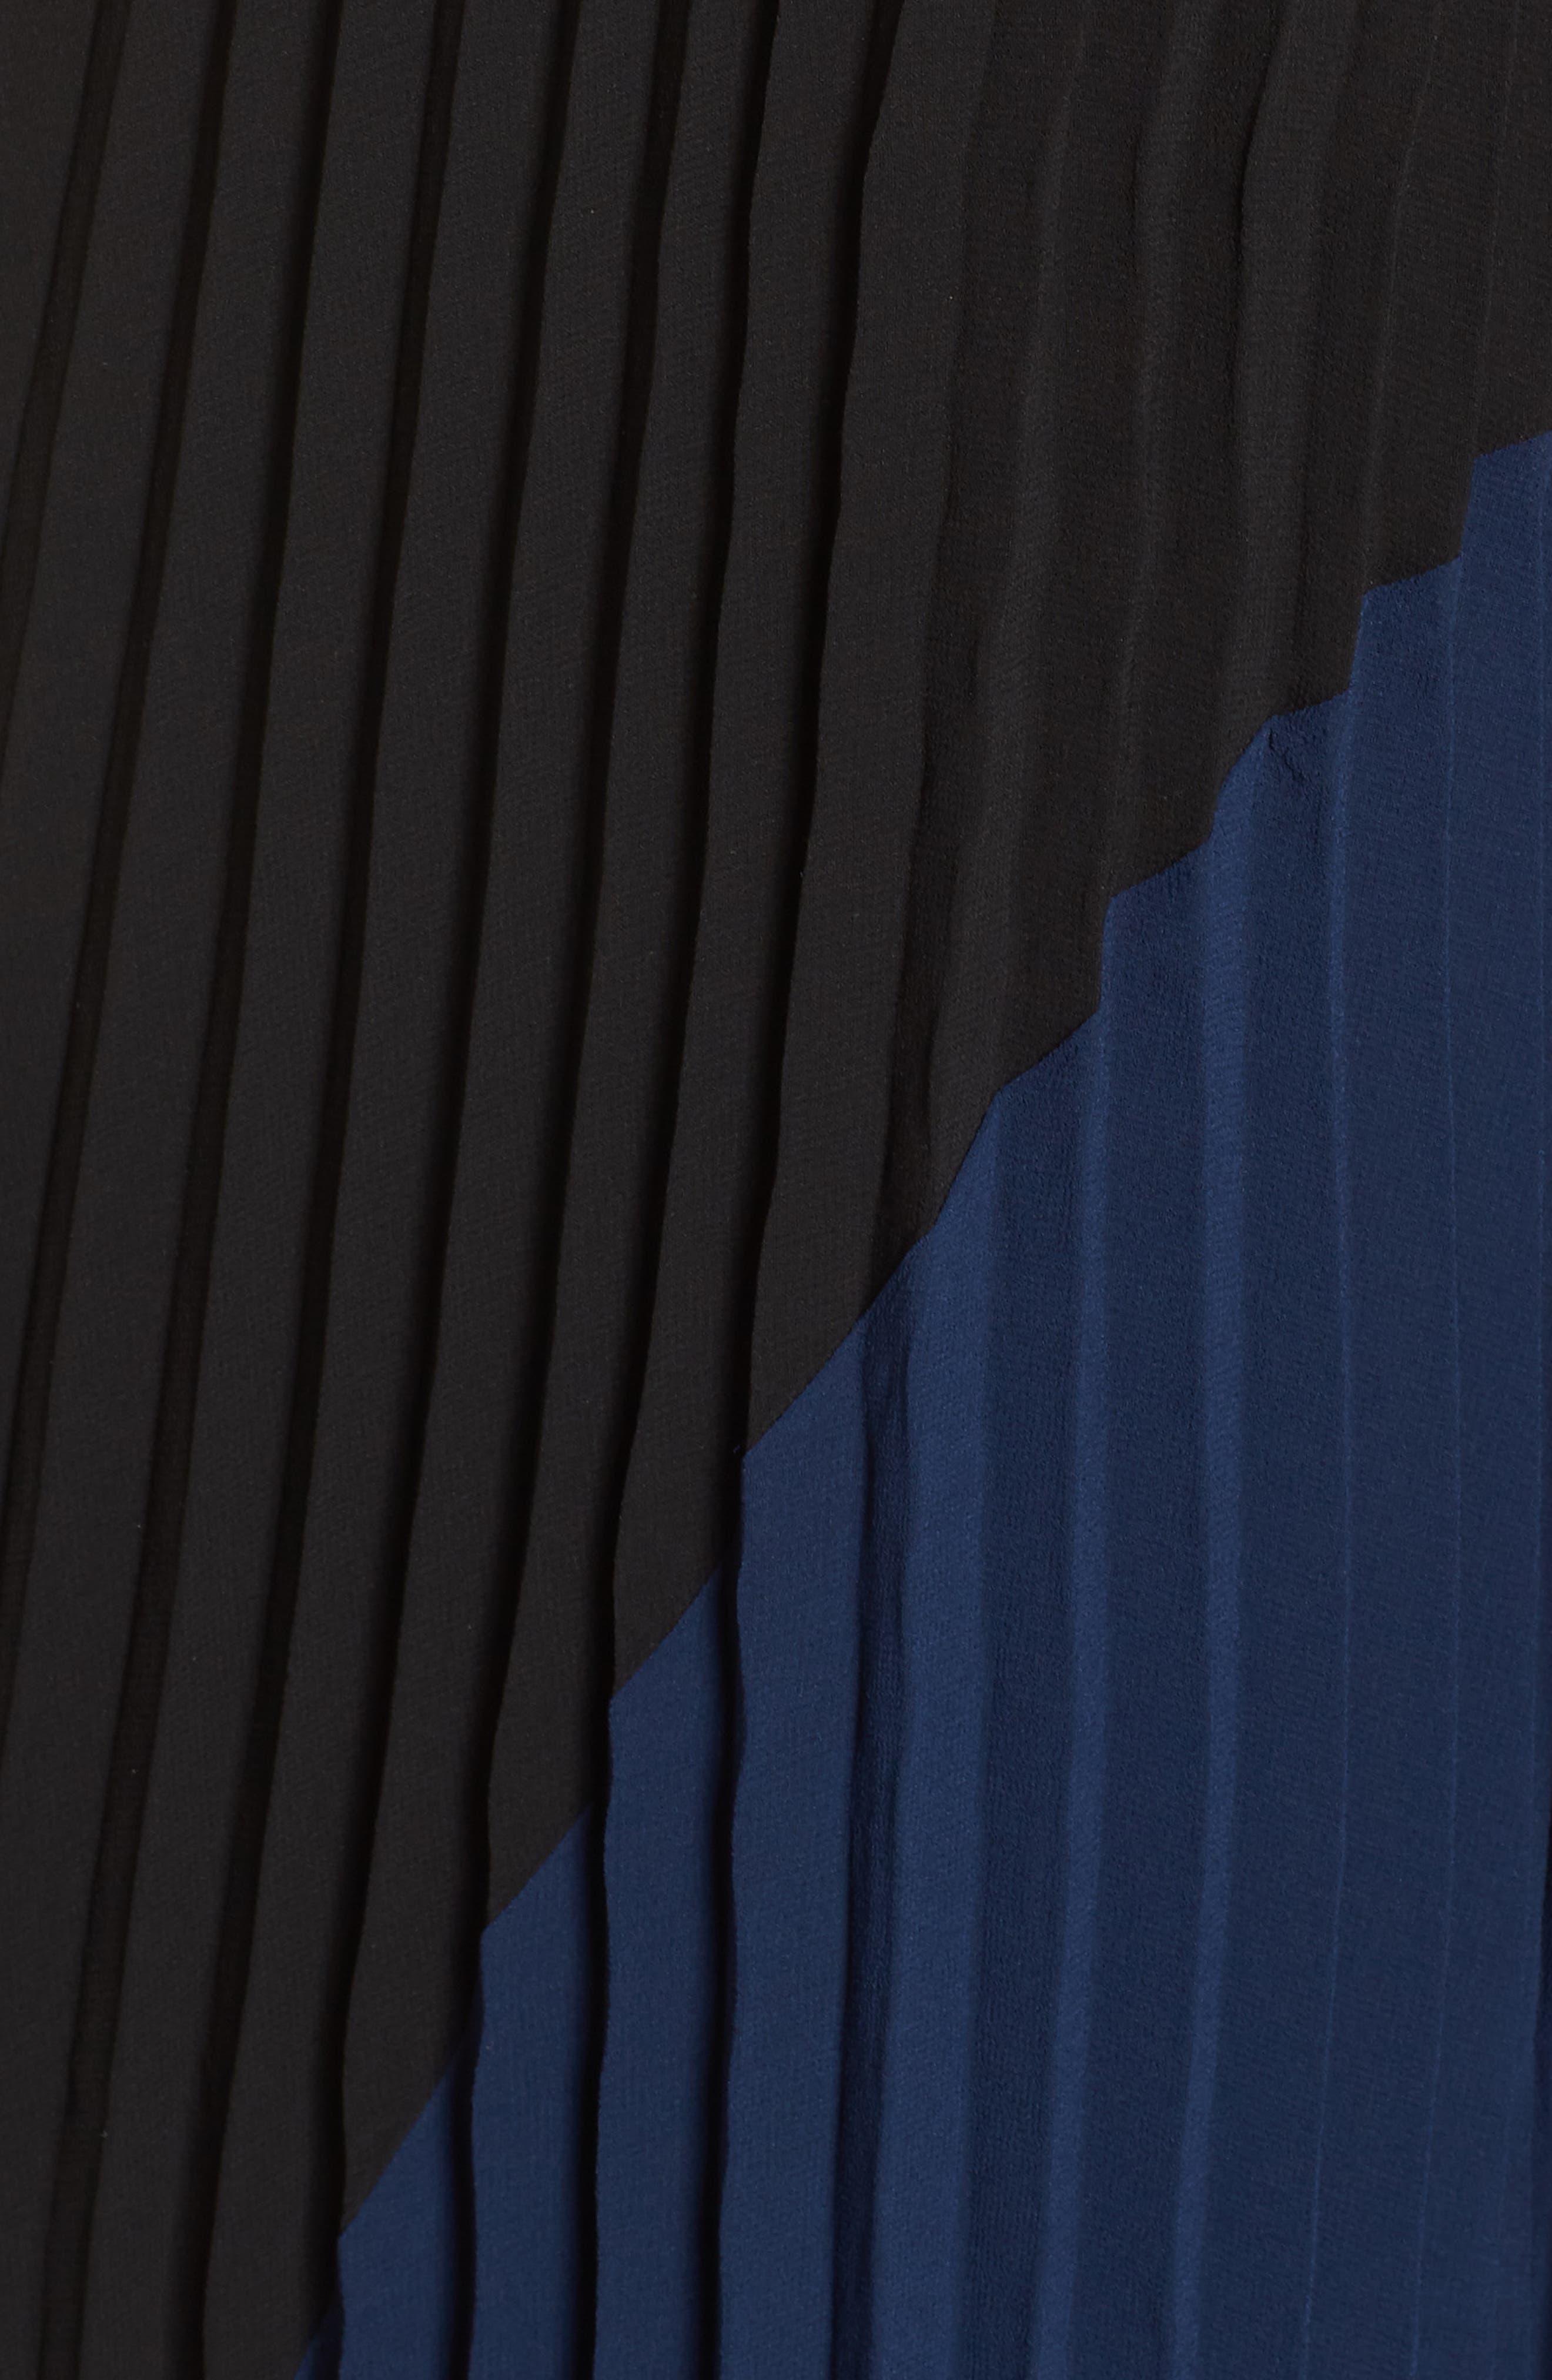 Nealea Pleat Chiffon Gown,                             Alternate thumbnail 6, color,                             Black/ Navy